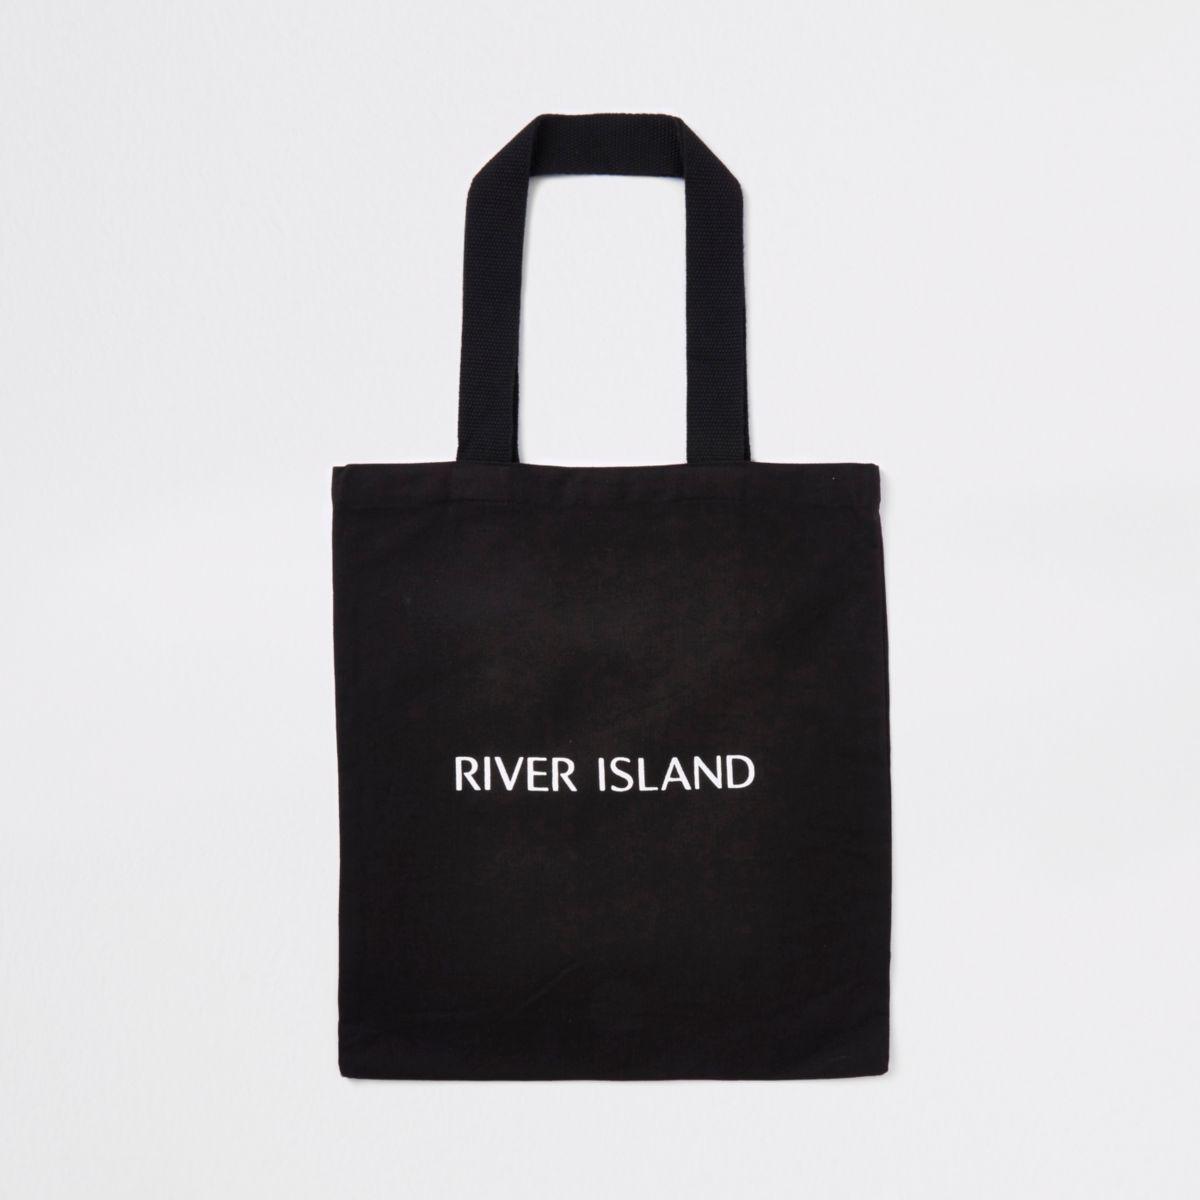 Black RI shopper tote bag